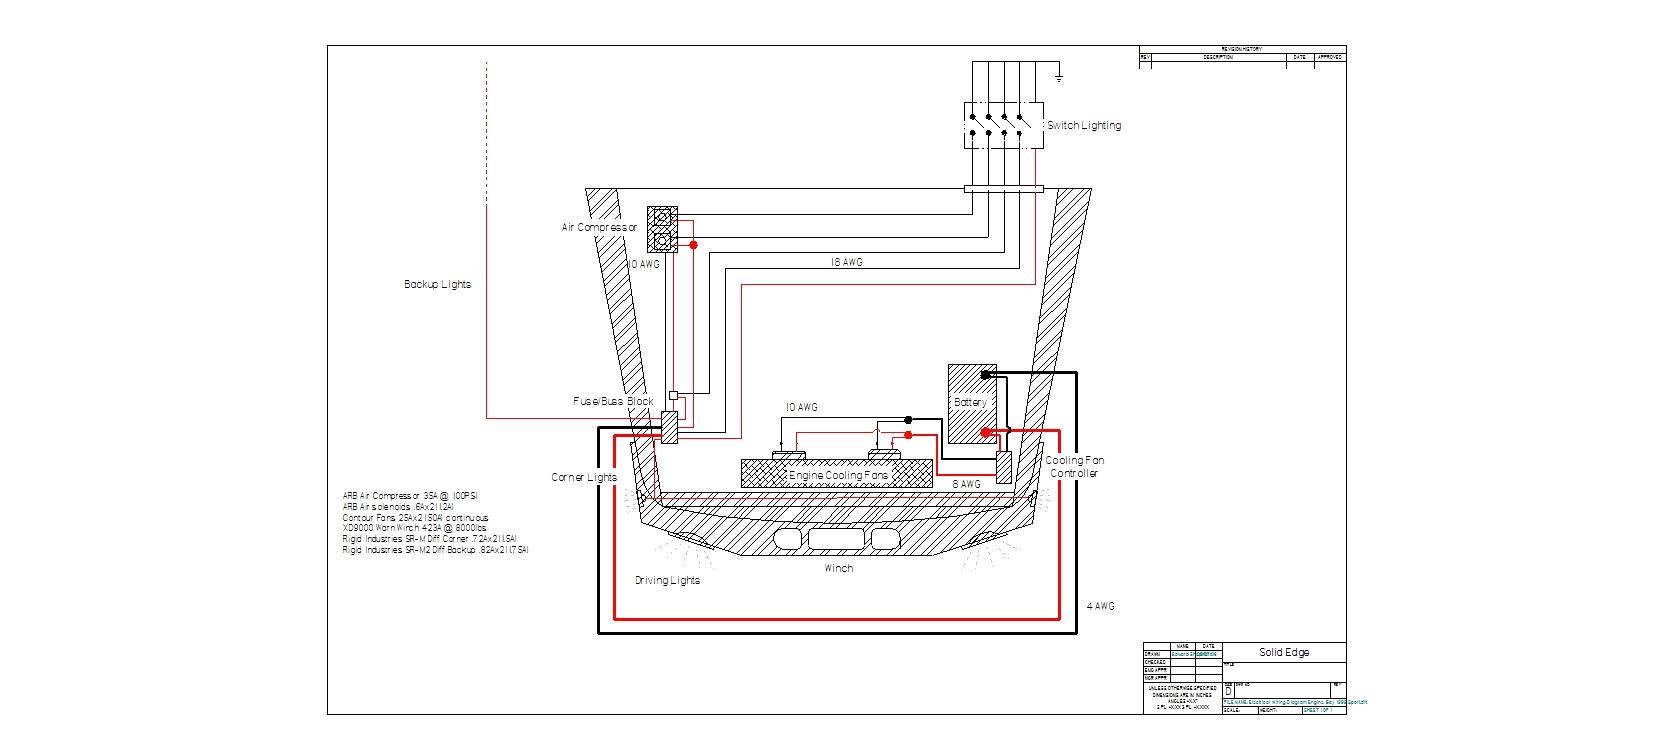 100 watt metal halide ballast wiring diagram